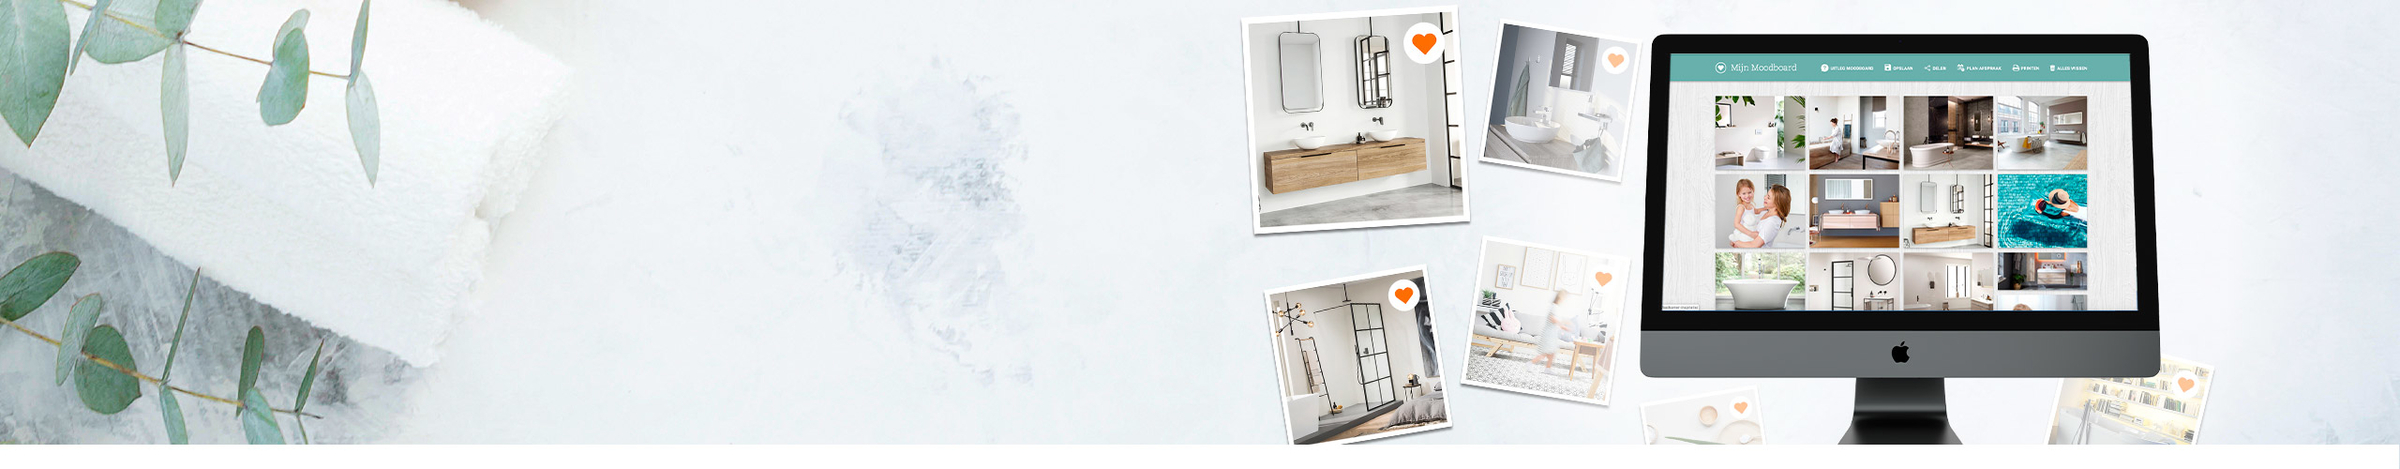 Badkamer moodboard maken - Ga aan de slag met je eigen badkamer moodboard